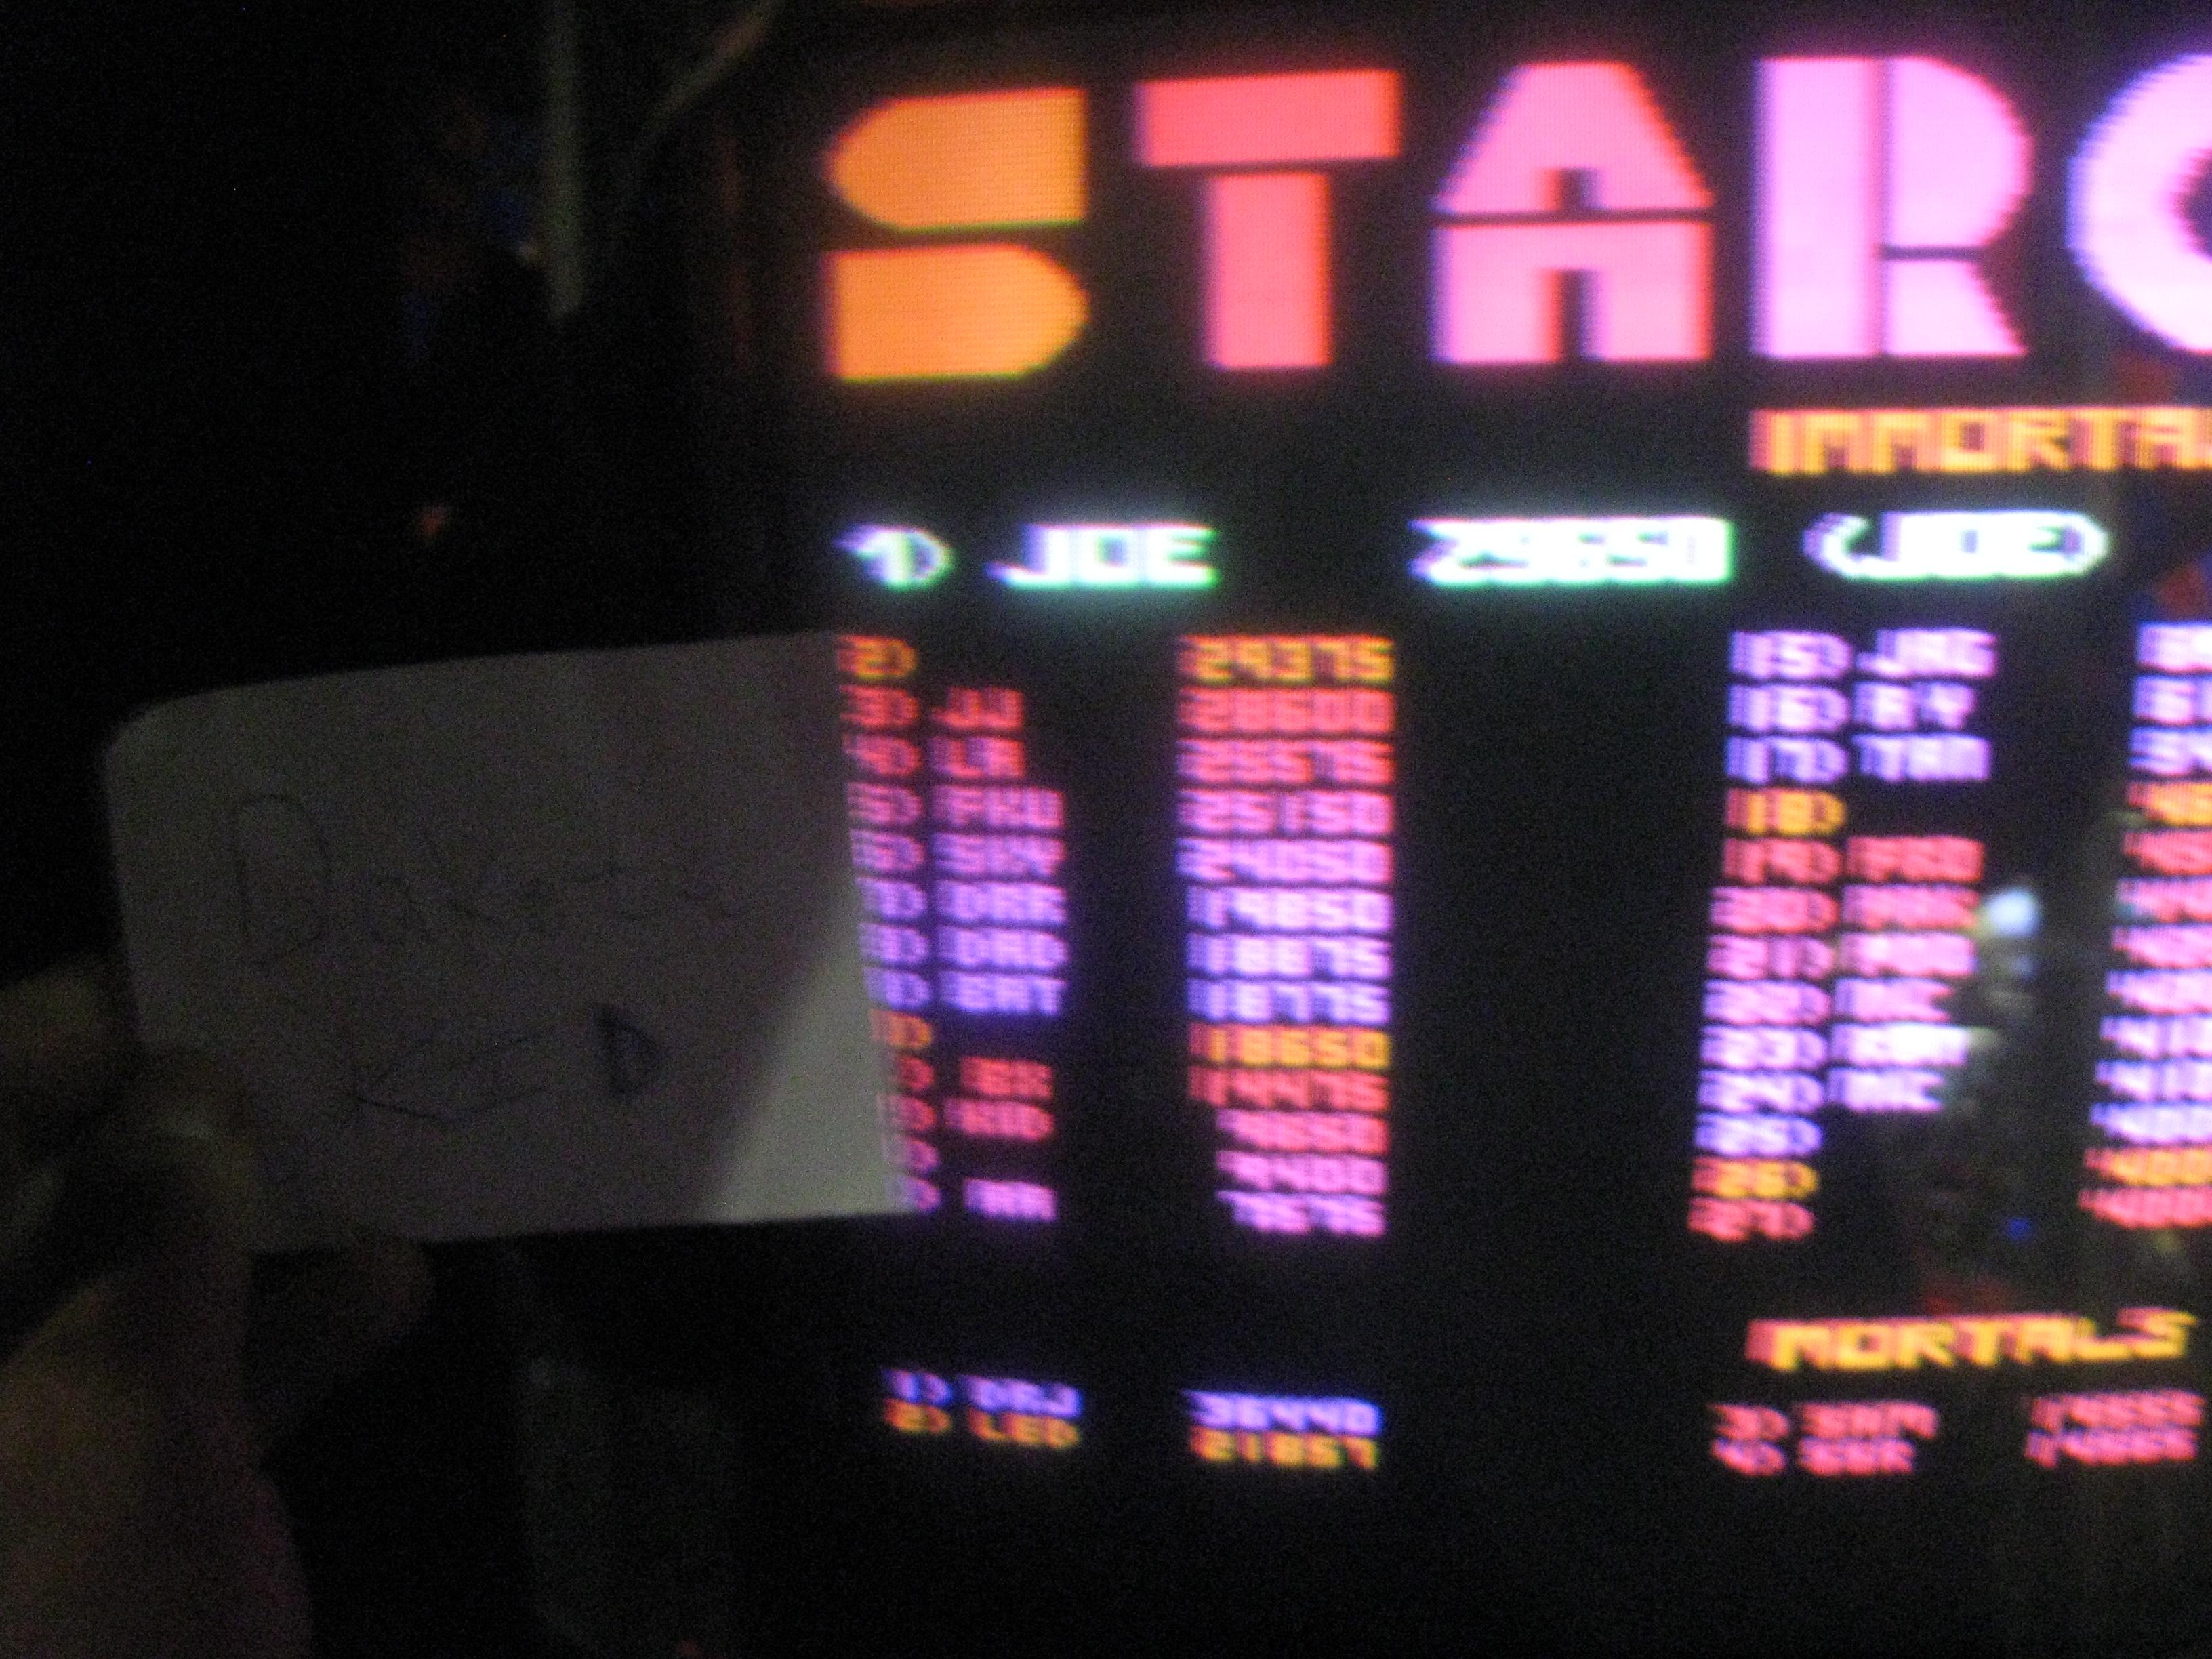 Stargate 9,650 points